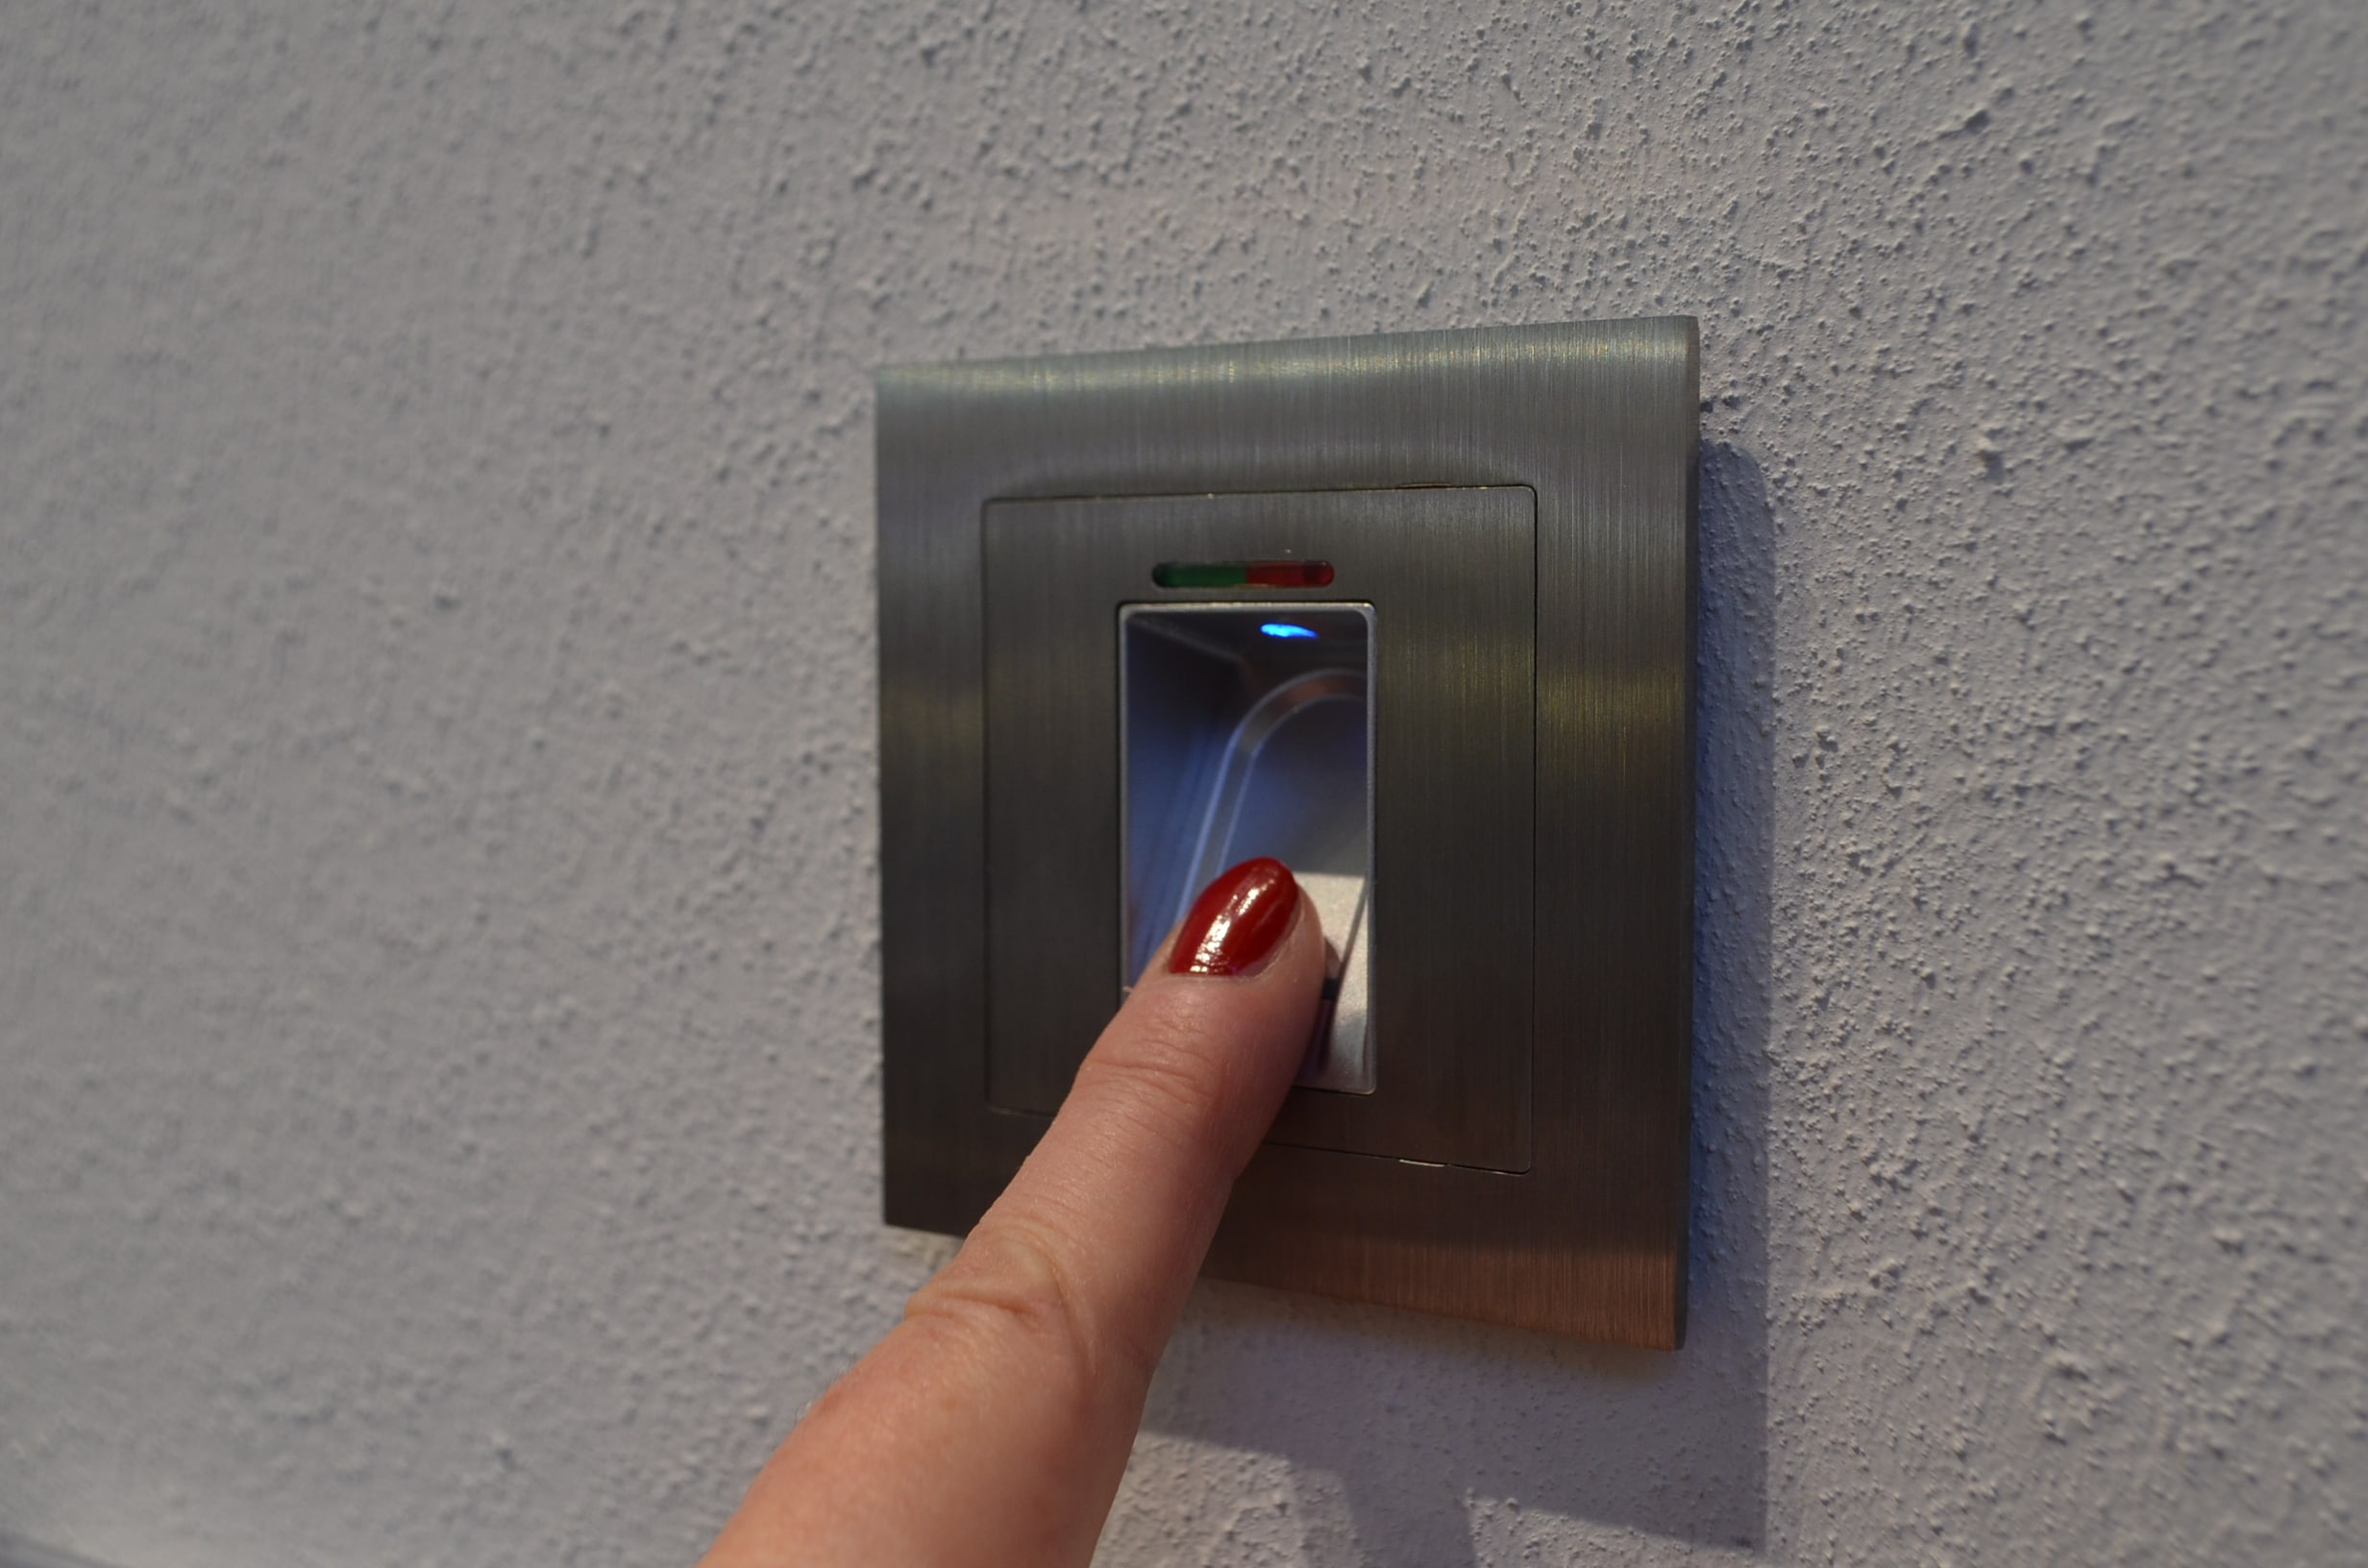 Gate biokey idencom polska for Door to gate kontakt